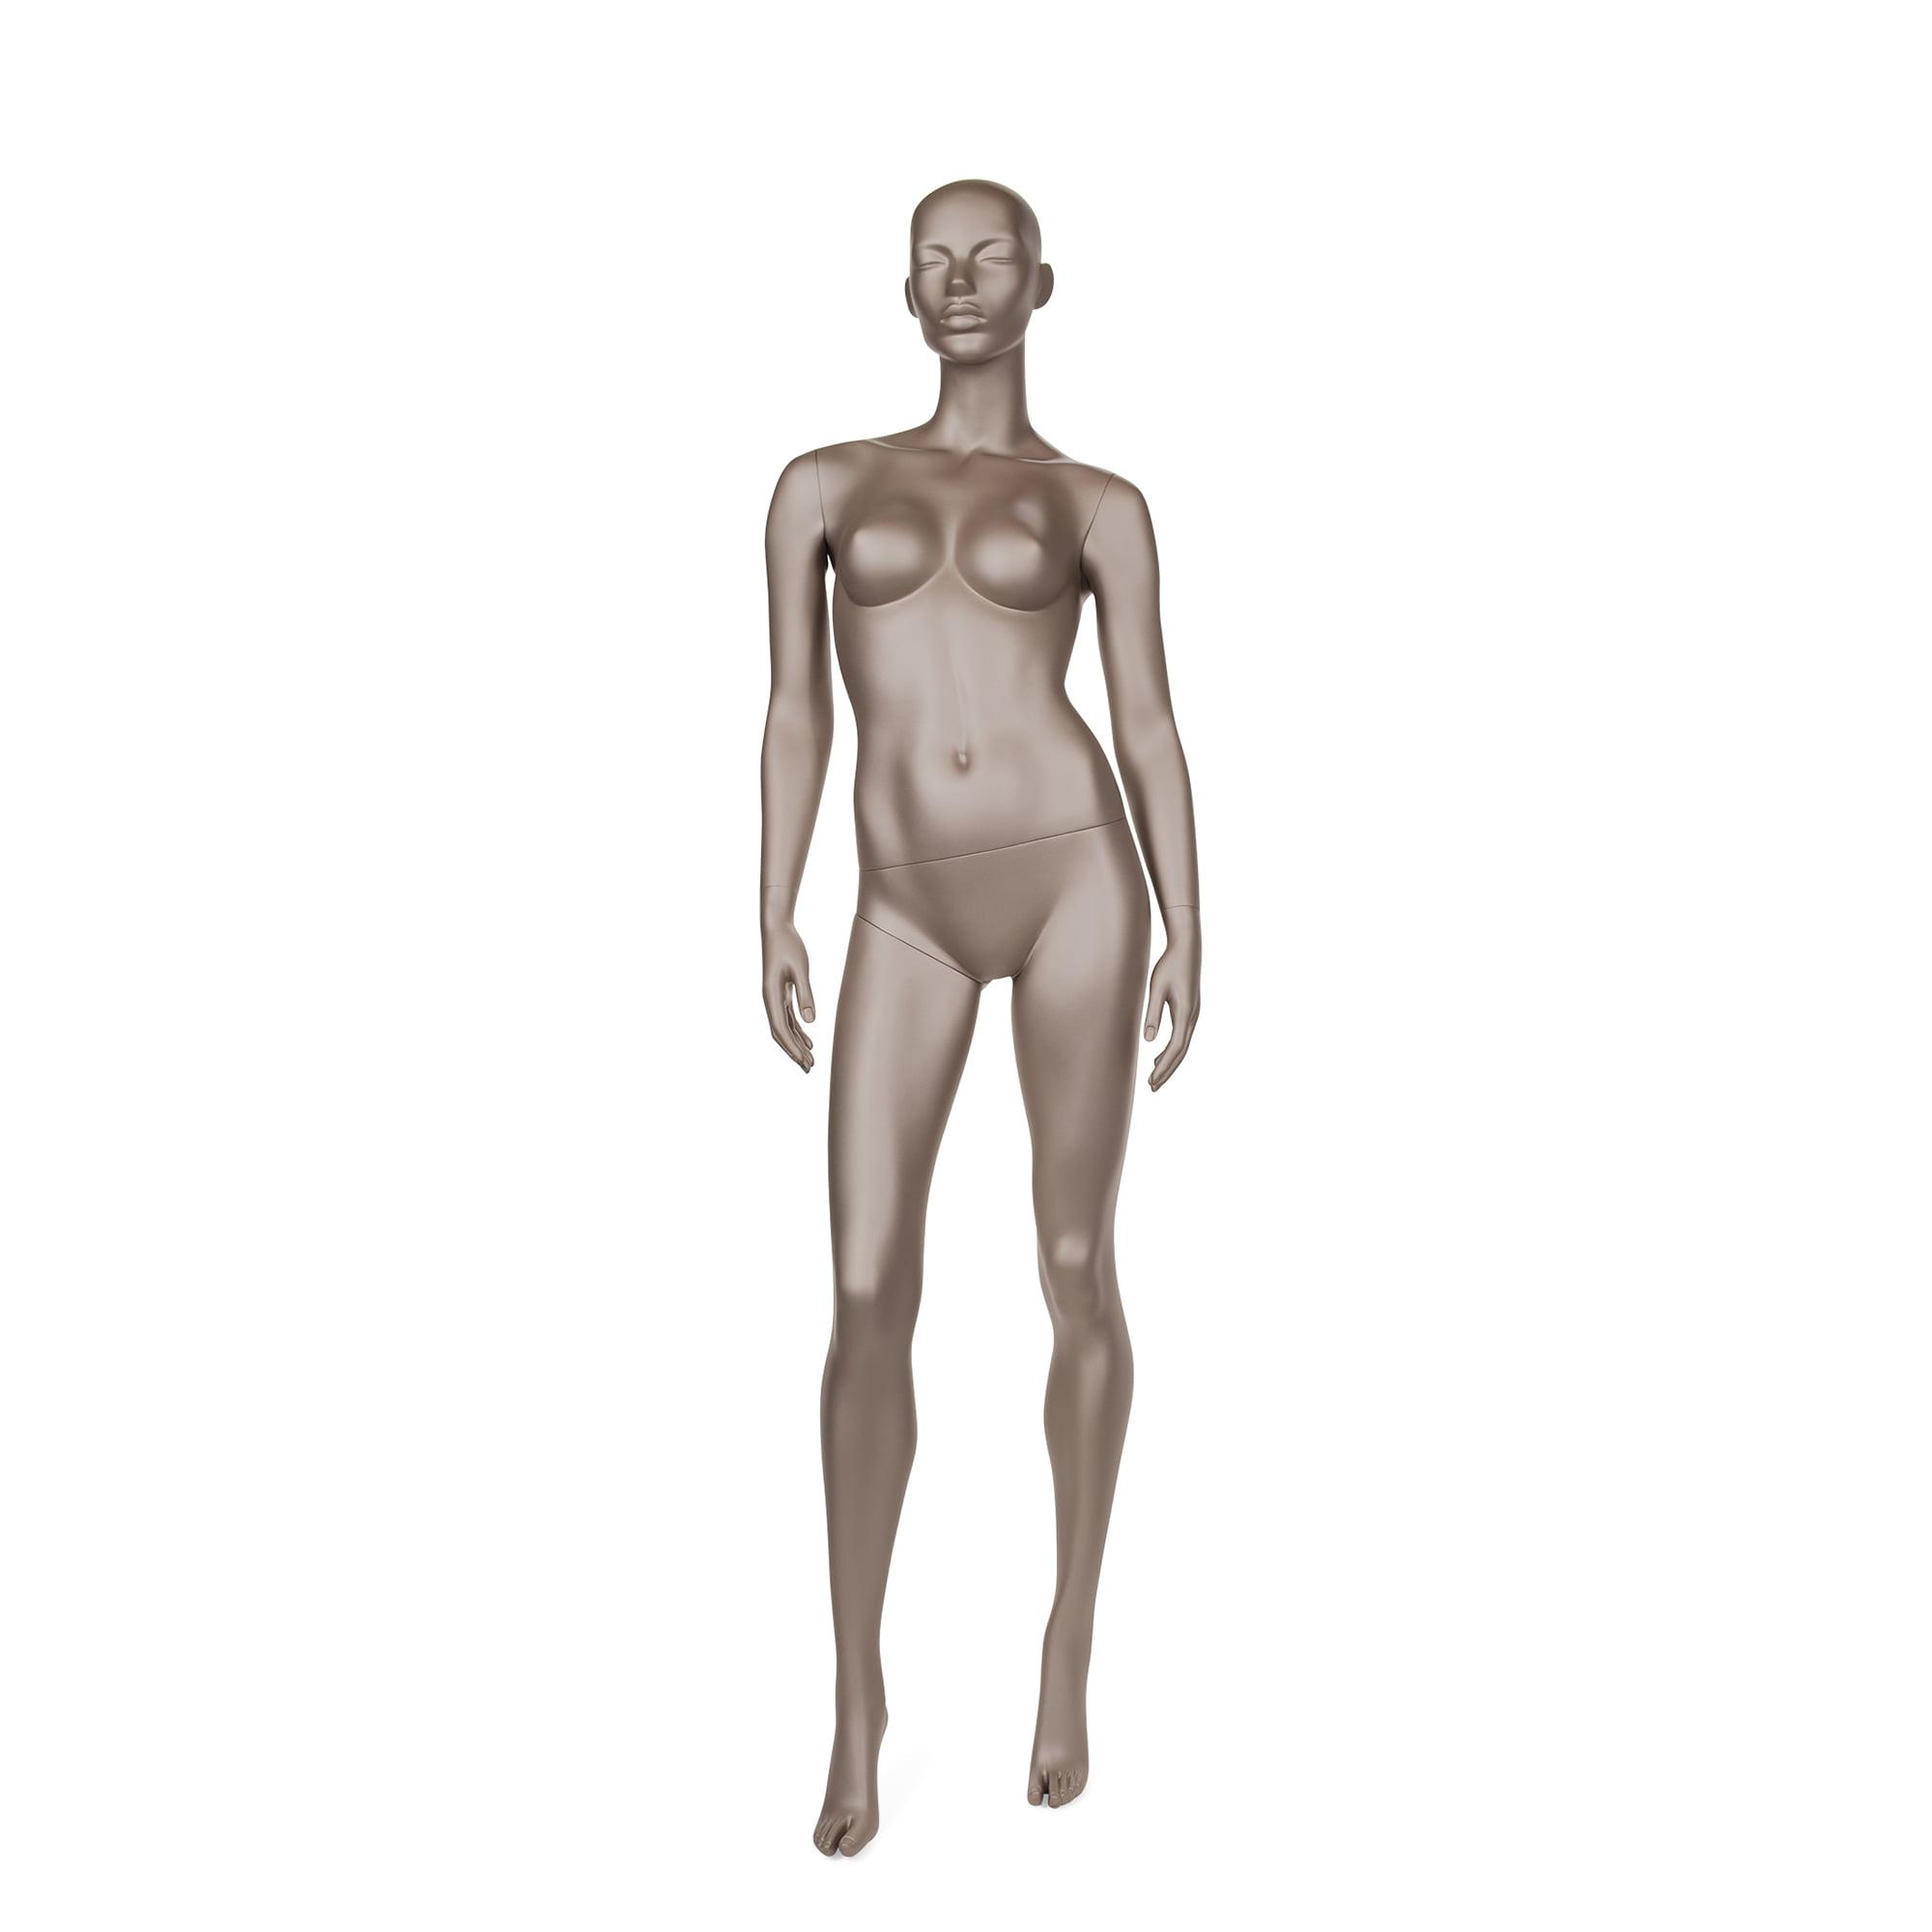 "Manechin Femeie Intimacy Mat 7 Colectia ""Intimacy Mat"""